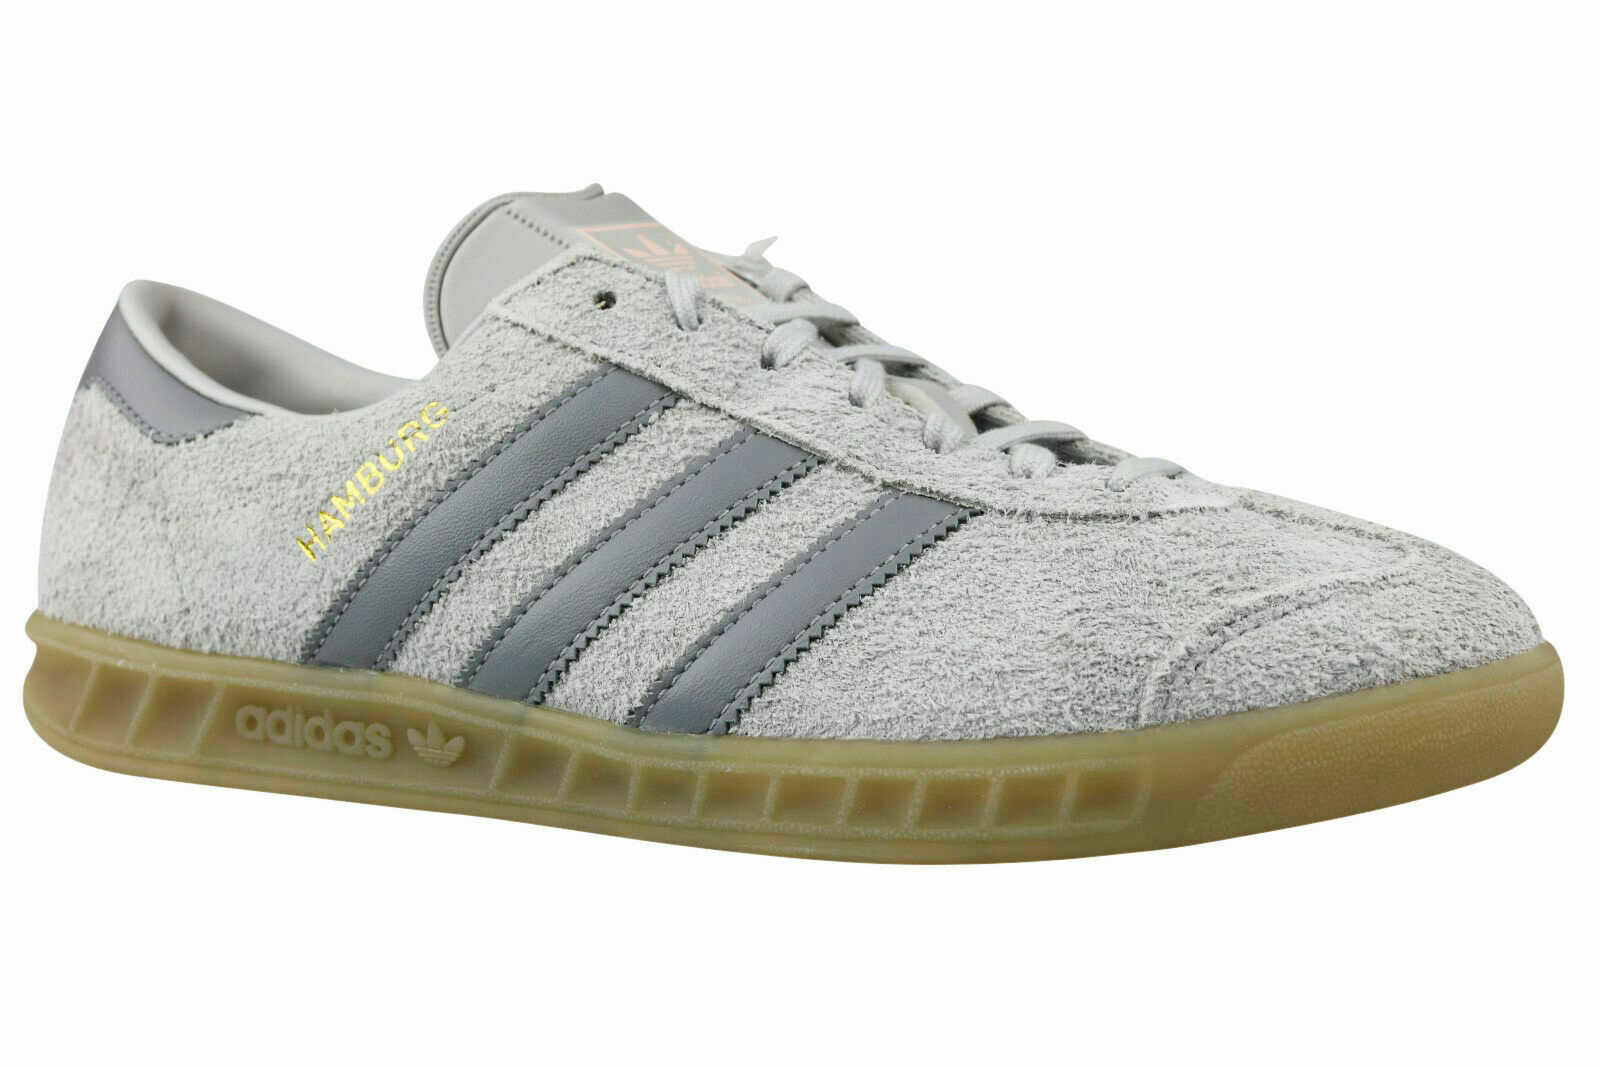 Adidas Originals Hamburg W Damen Turnschuhe Schuhe BY9676 grau Gr. 36 - 42,5 NEU